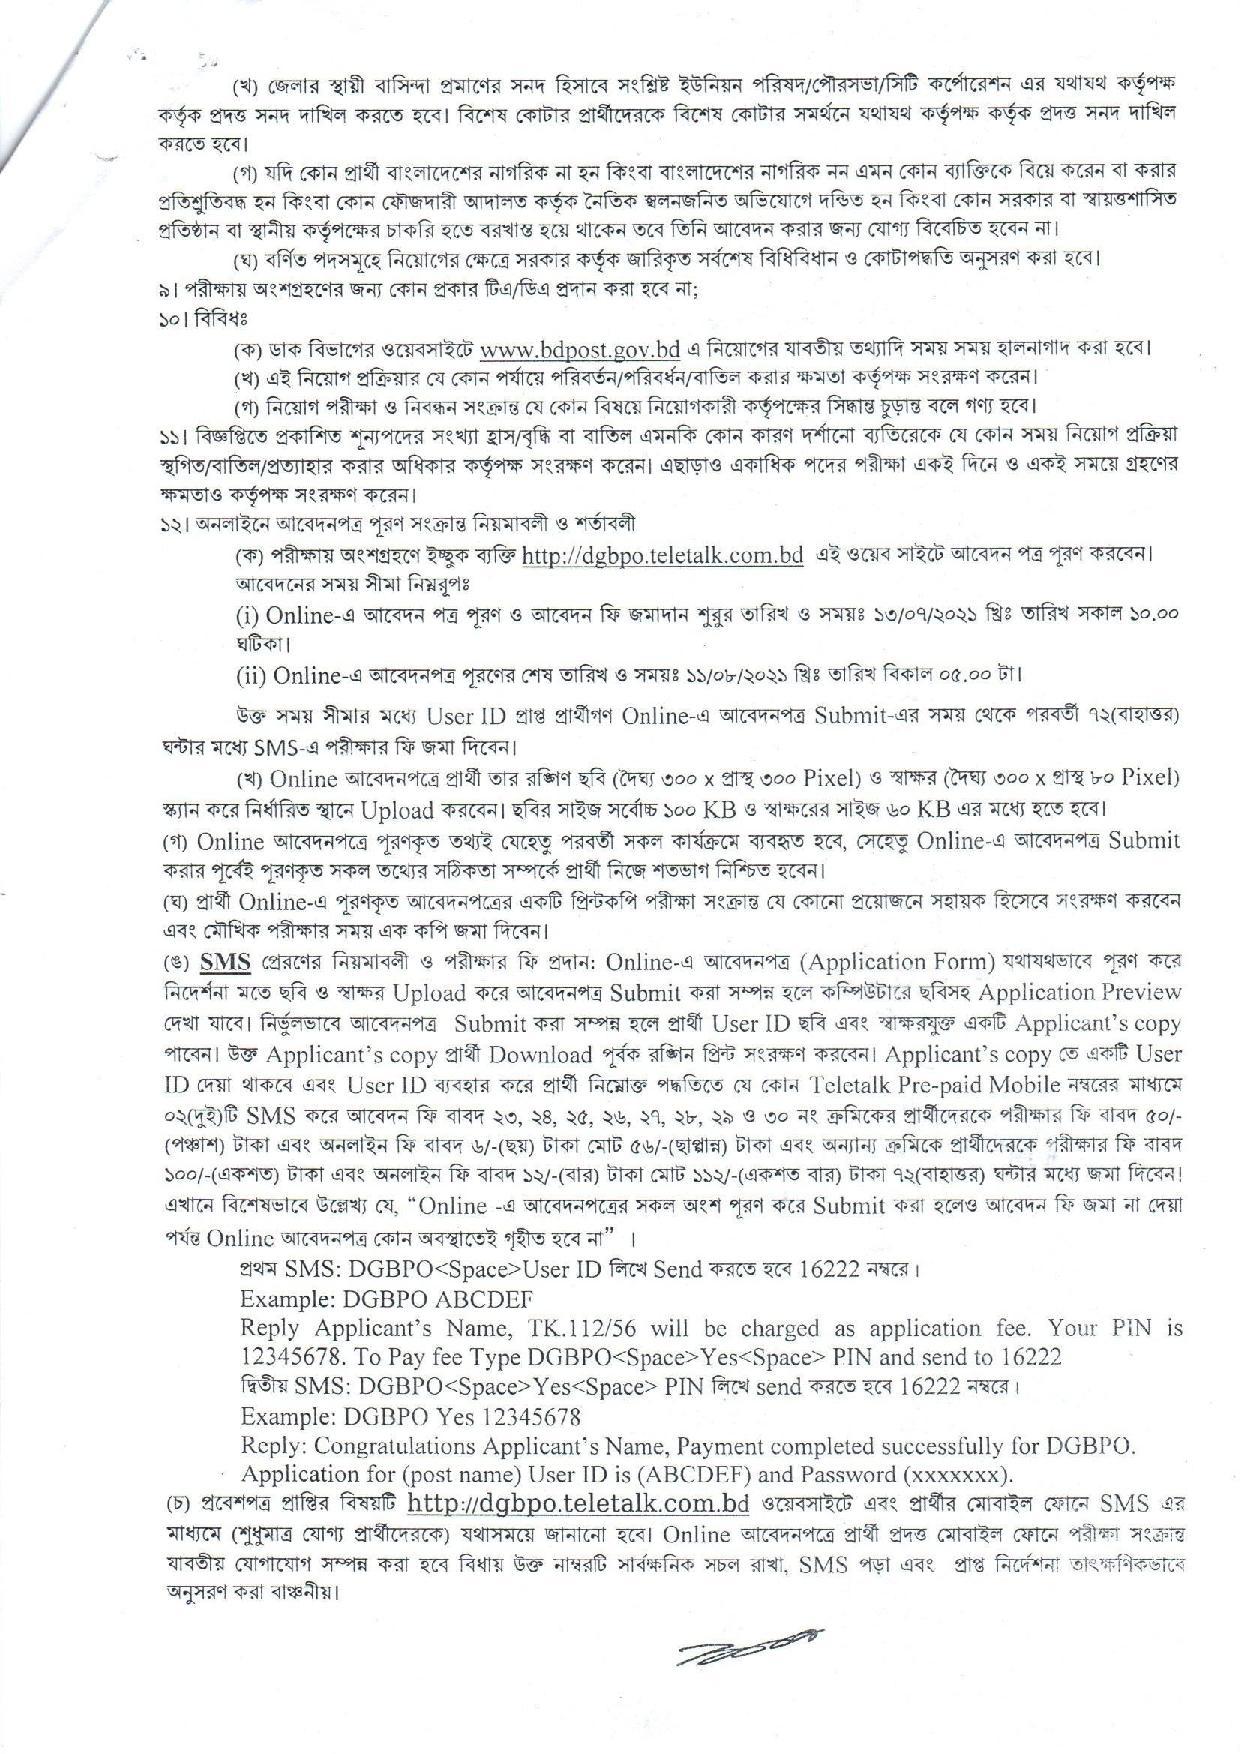 2021-07-12-07-30-fdaaf28c75f086c5943aab25320ce96f-page-005